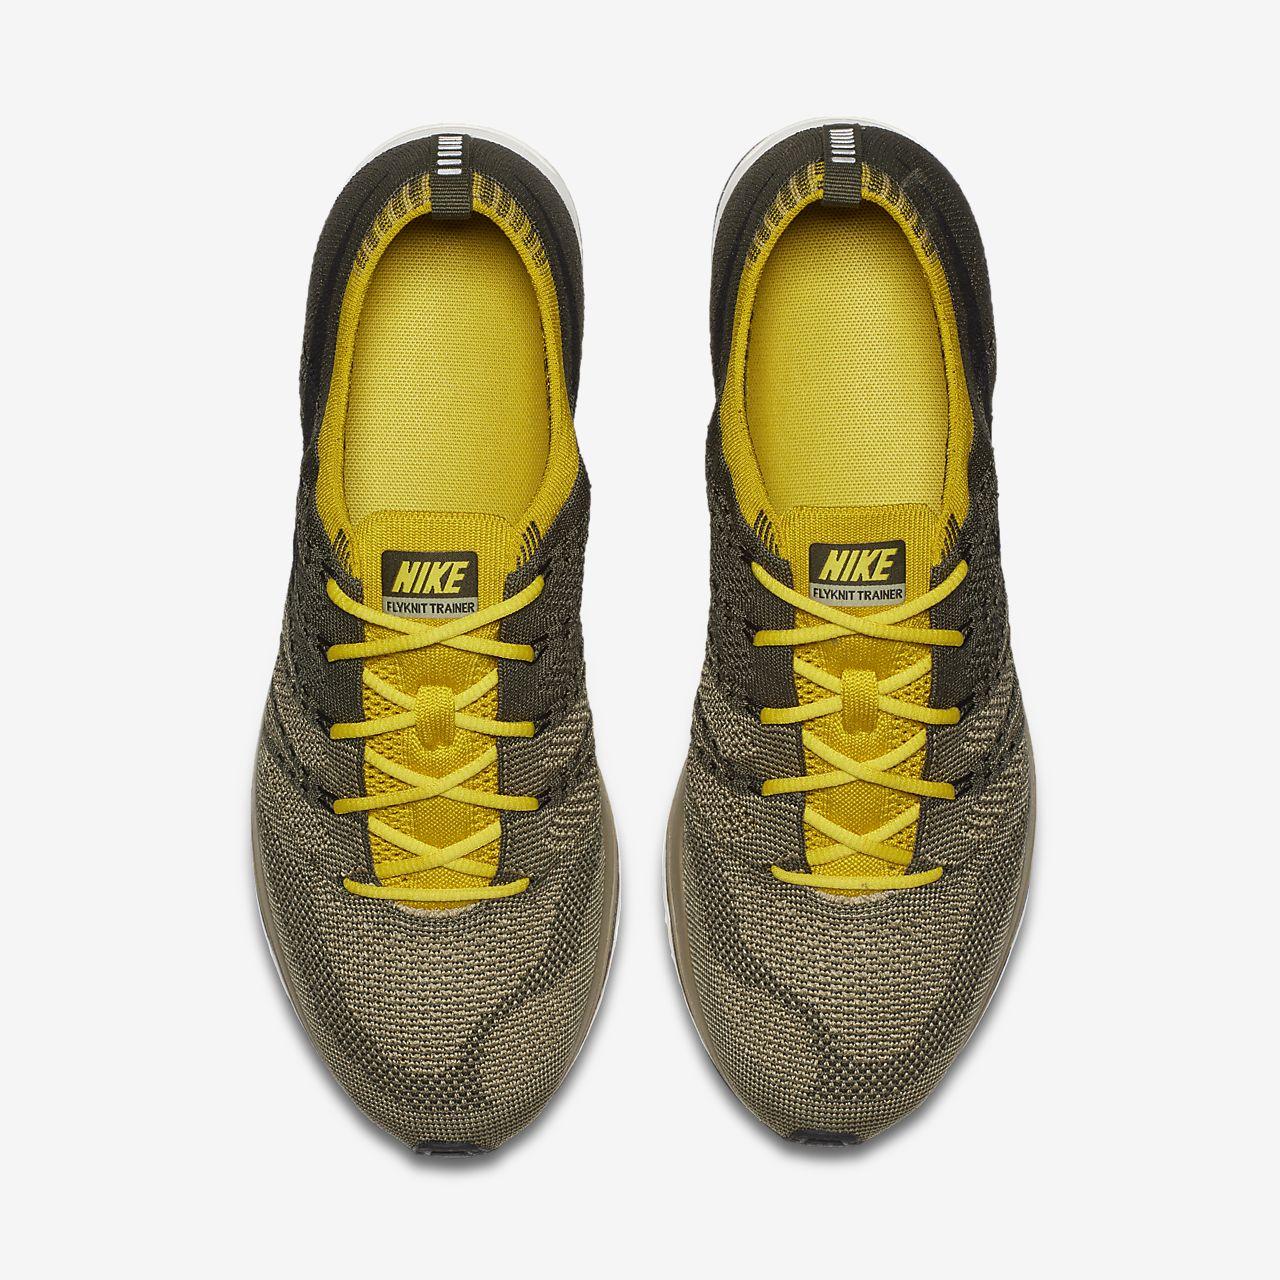 promo code 5f0e7 fee83 ... Nike Flyknit Trainer Unisex Shoe